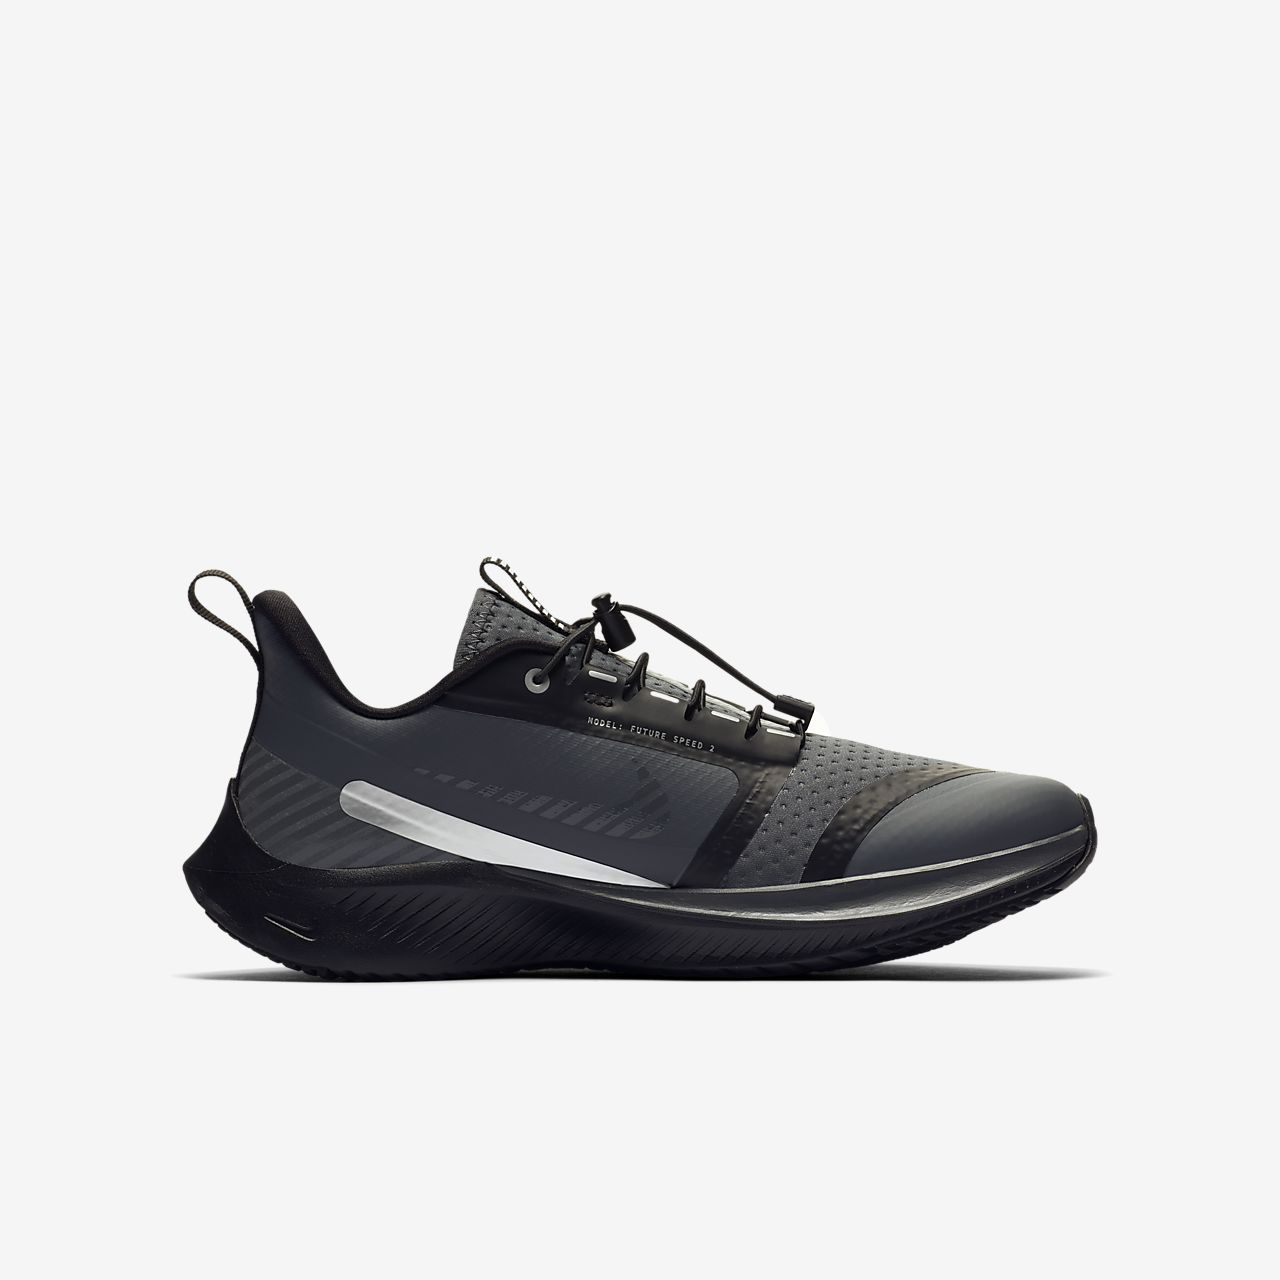 Für Shield Laufschuh Kinder Speed 2 Ältere Nike Future VLqzpGSUM